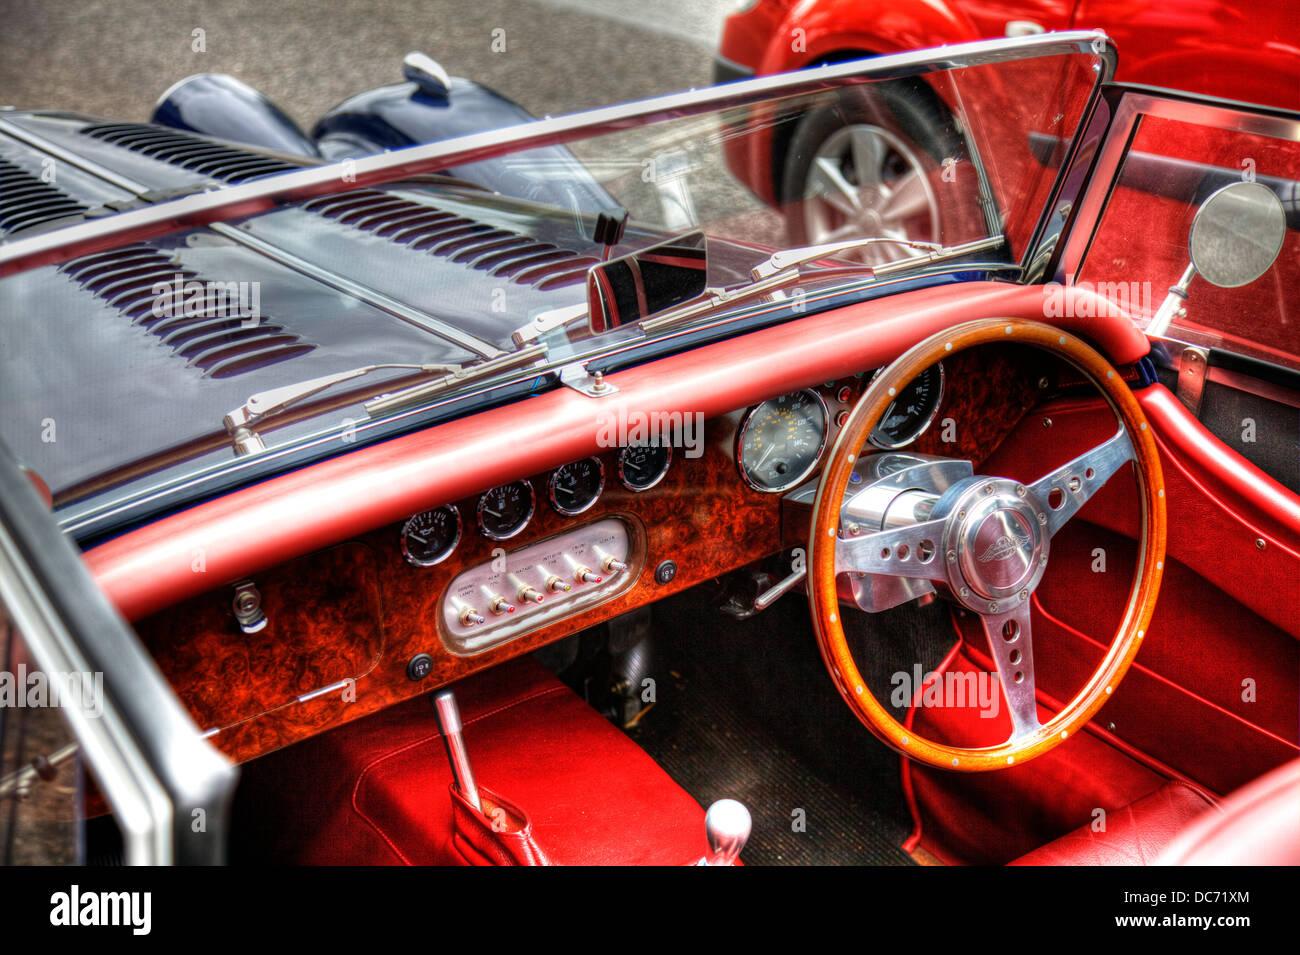 Inside Morgan Sports Car Vehicle Red Interior Walnut Dash Dashboard